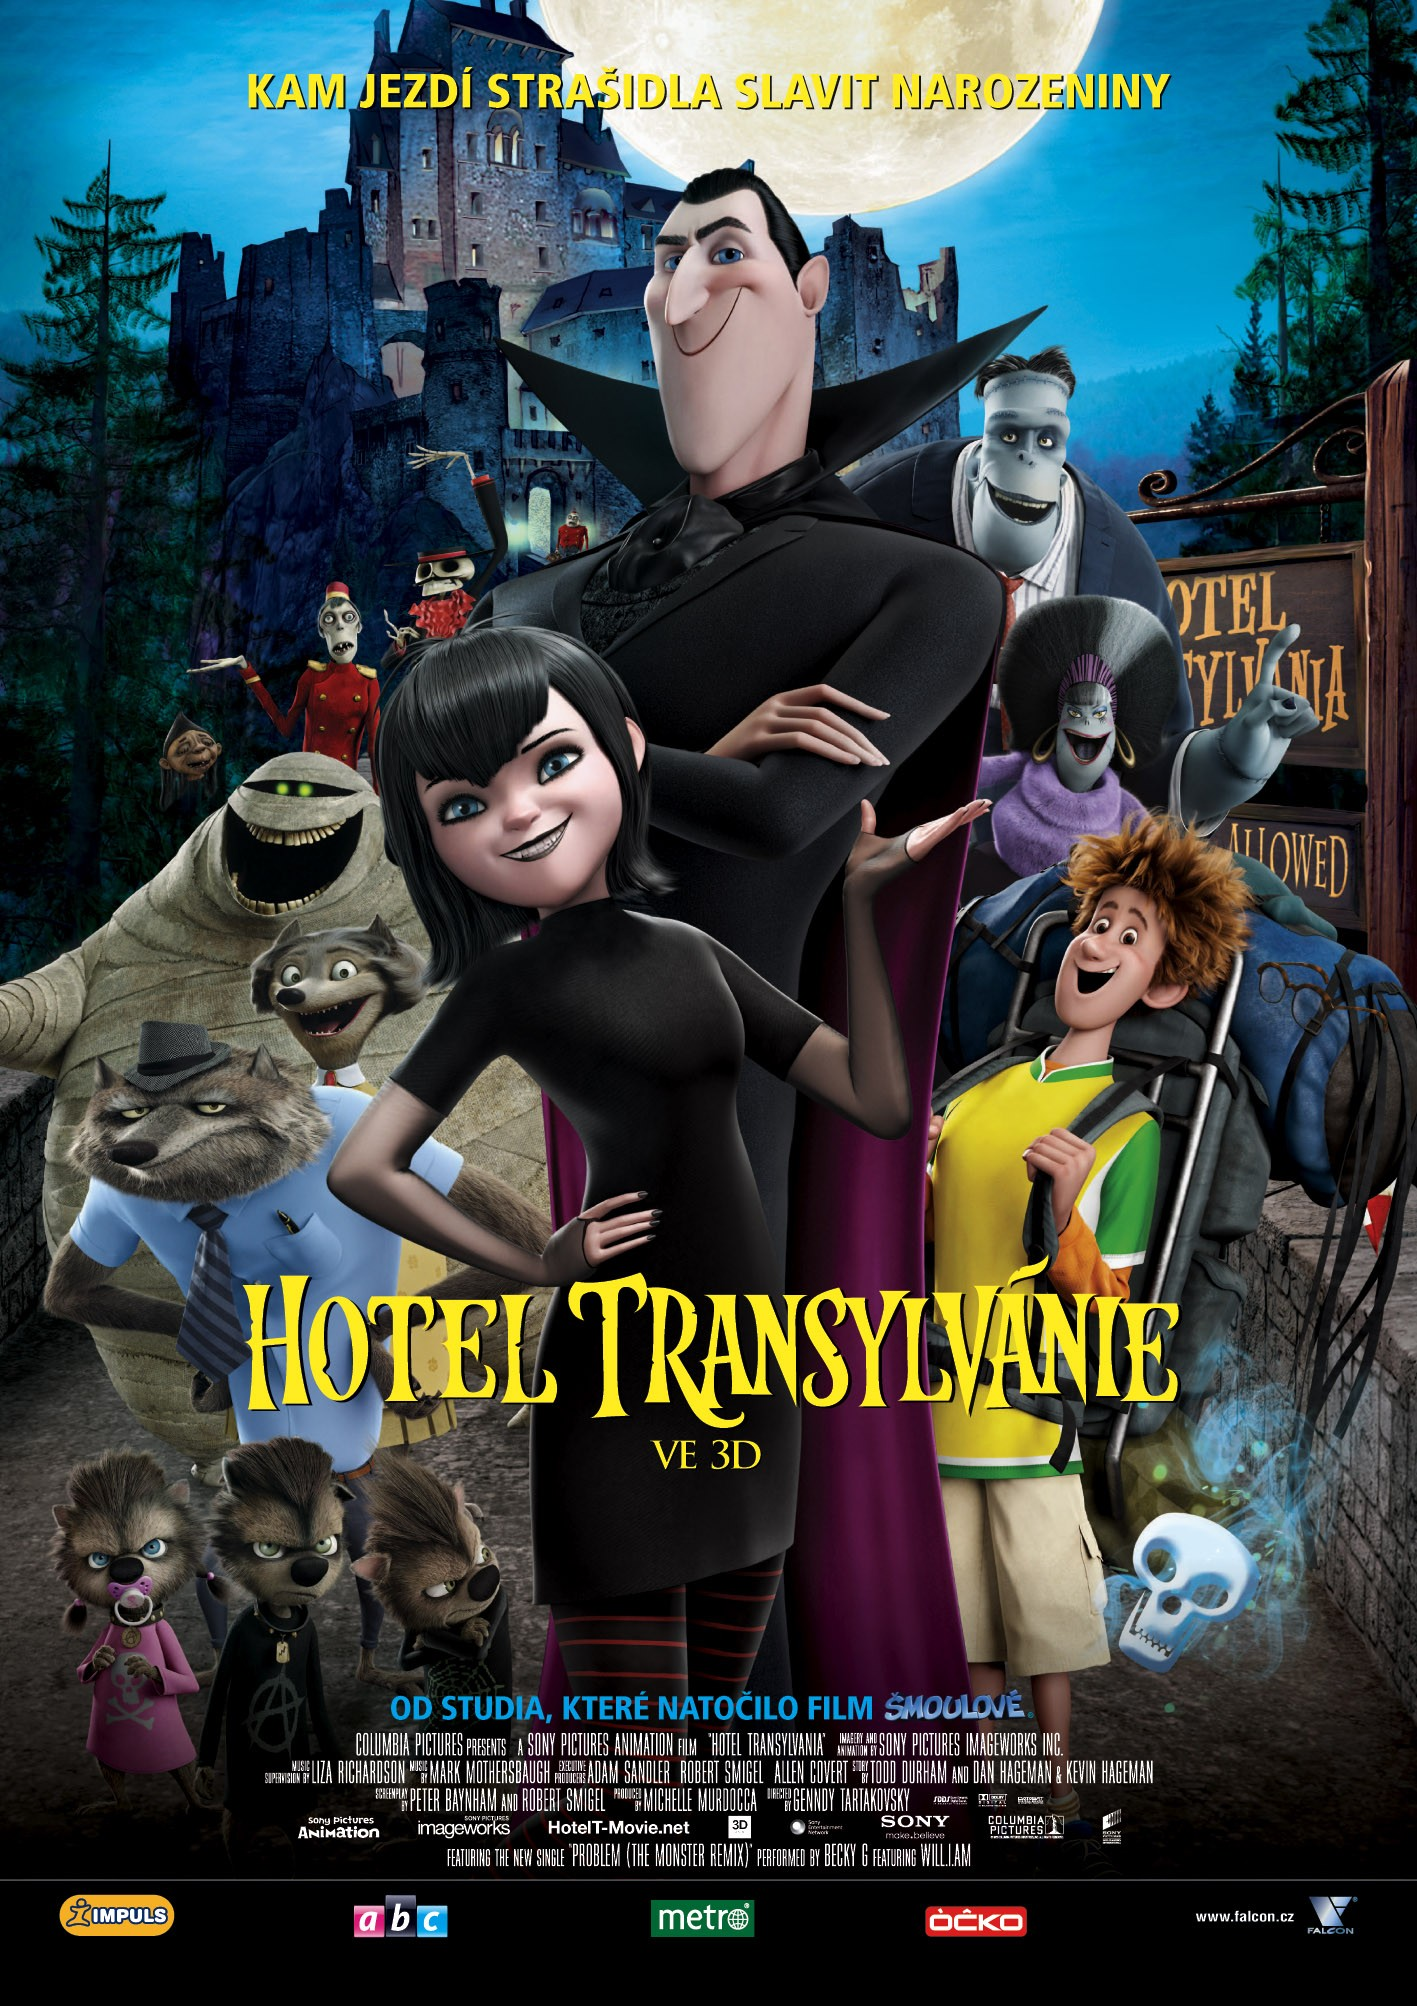 Hotel Transylvania 2 Full Movie Online Free